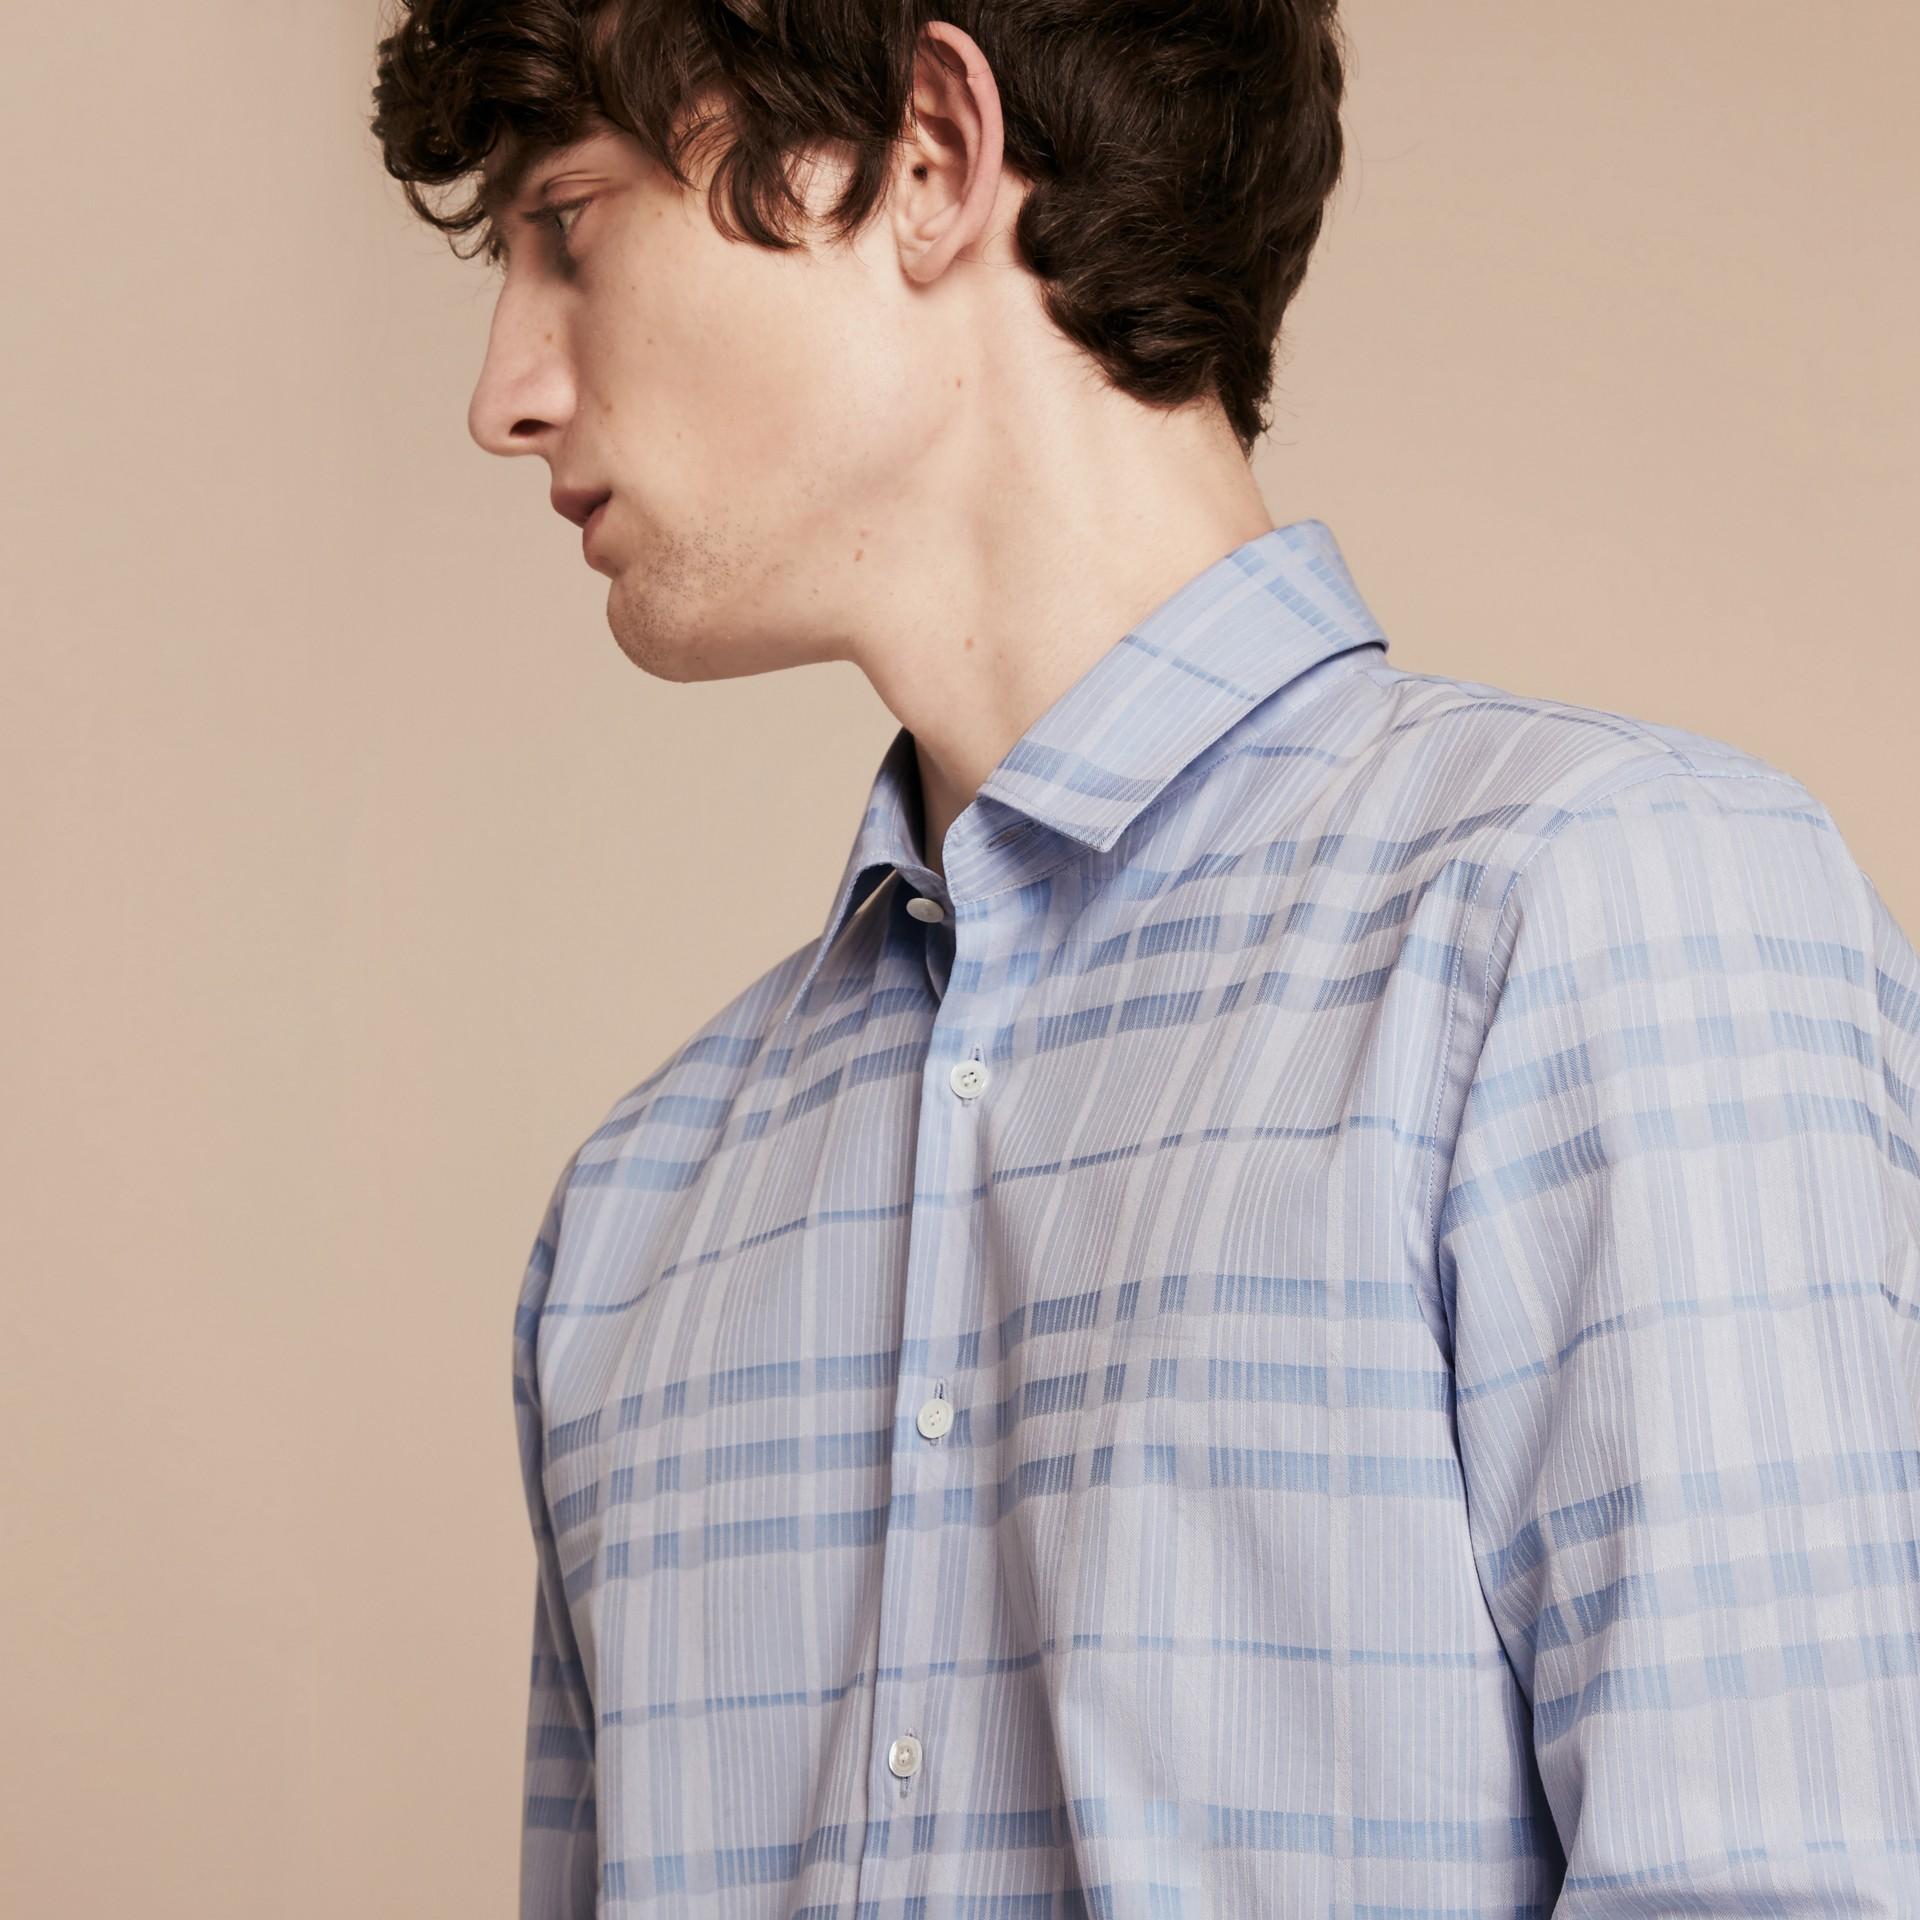 City blue Check Jacquard Cotton Shirt City Blue - gallery image 5